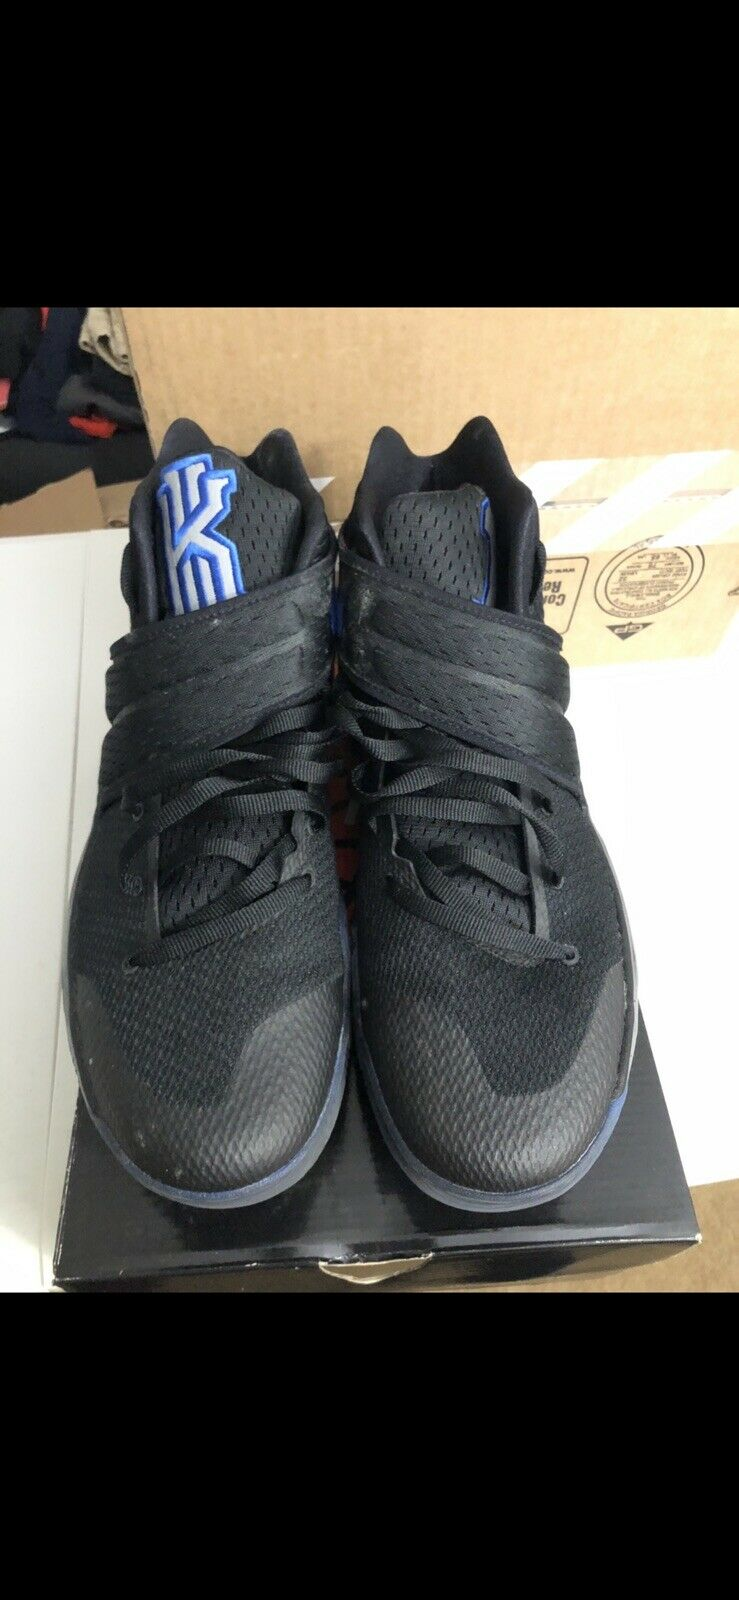 detailed look 8cbce b2764 Nike Kyrie 2 DUKE size 14. PE Blue Devils. 838639-001 QS LTD LIMITED. Black  3M.